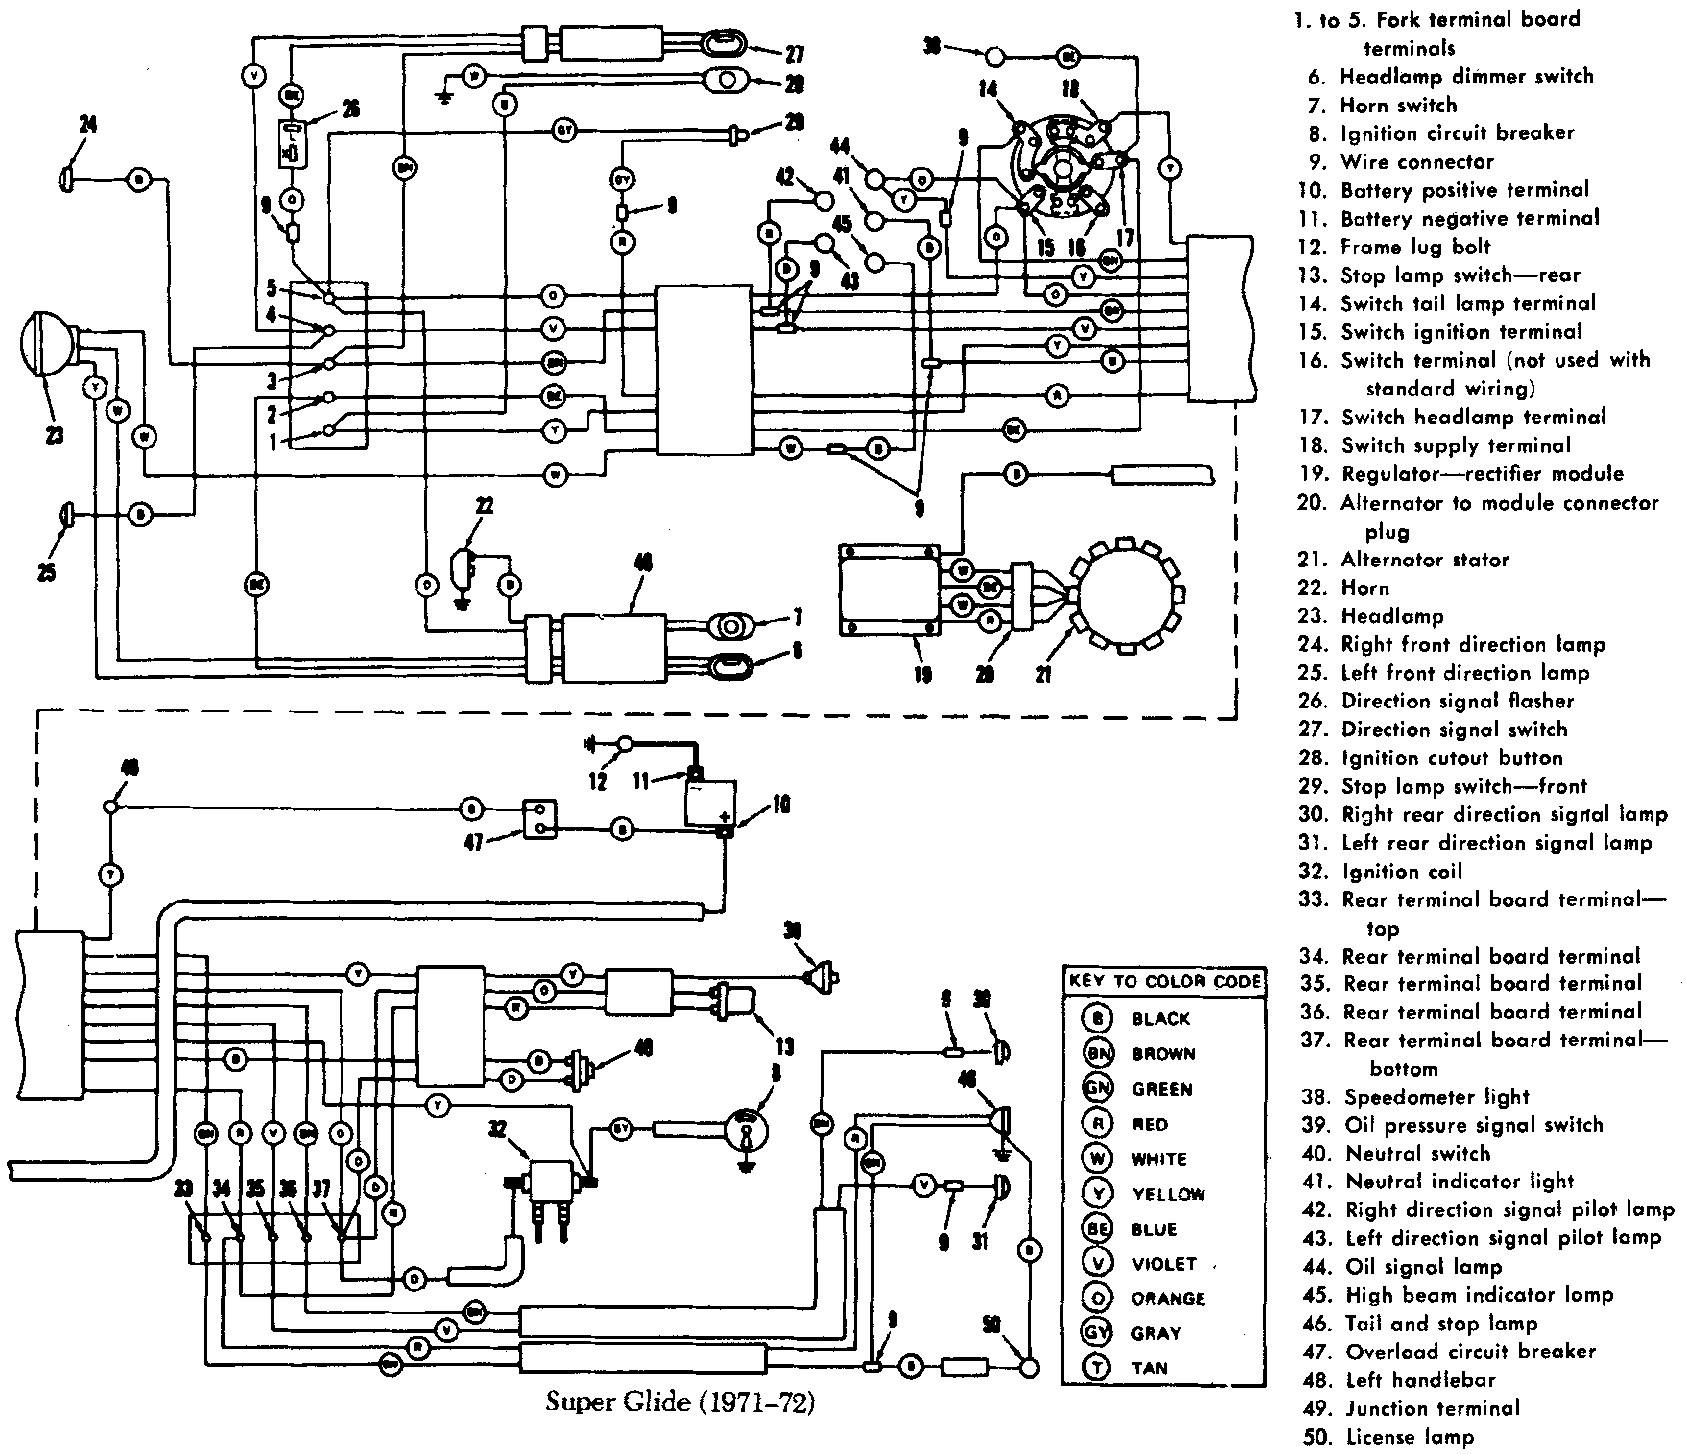 Harley Davidson V Twin Engine Diagrams | Wiring Liry on